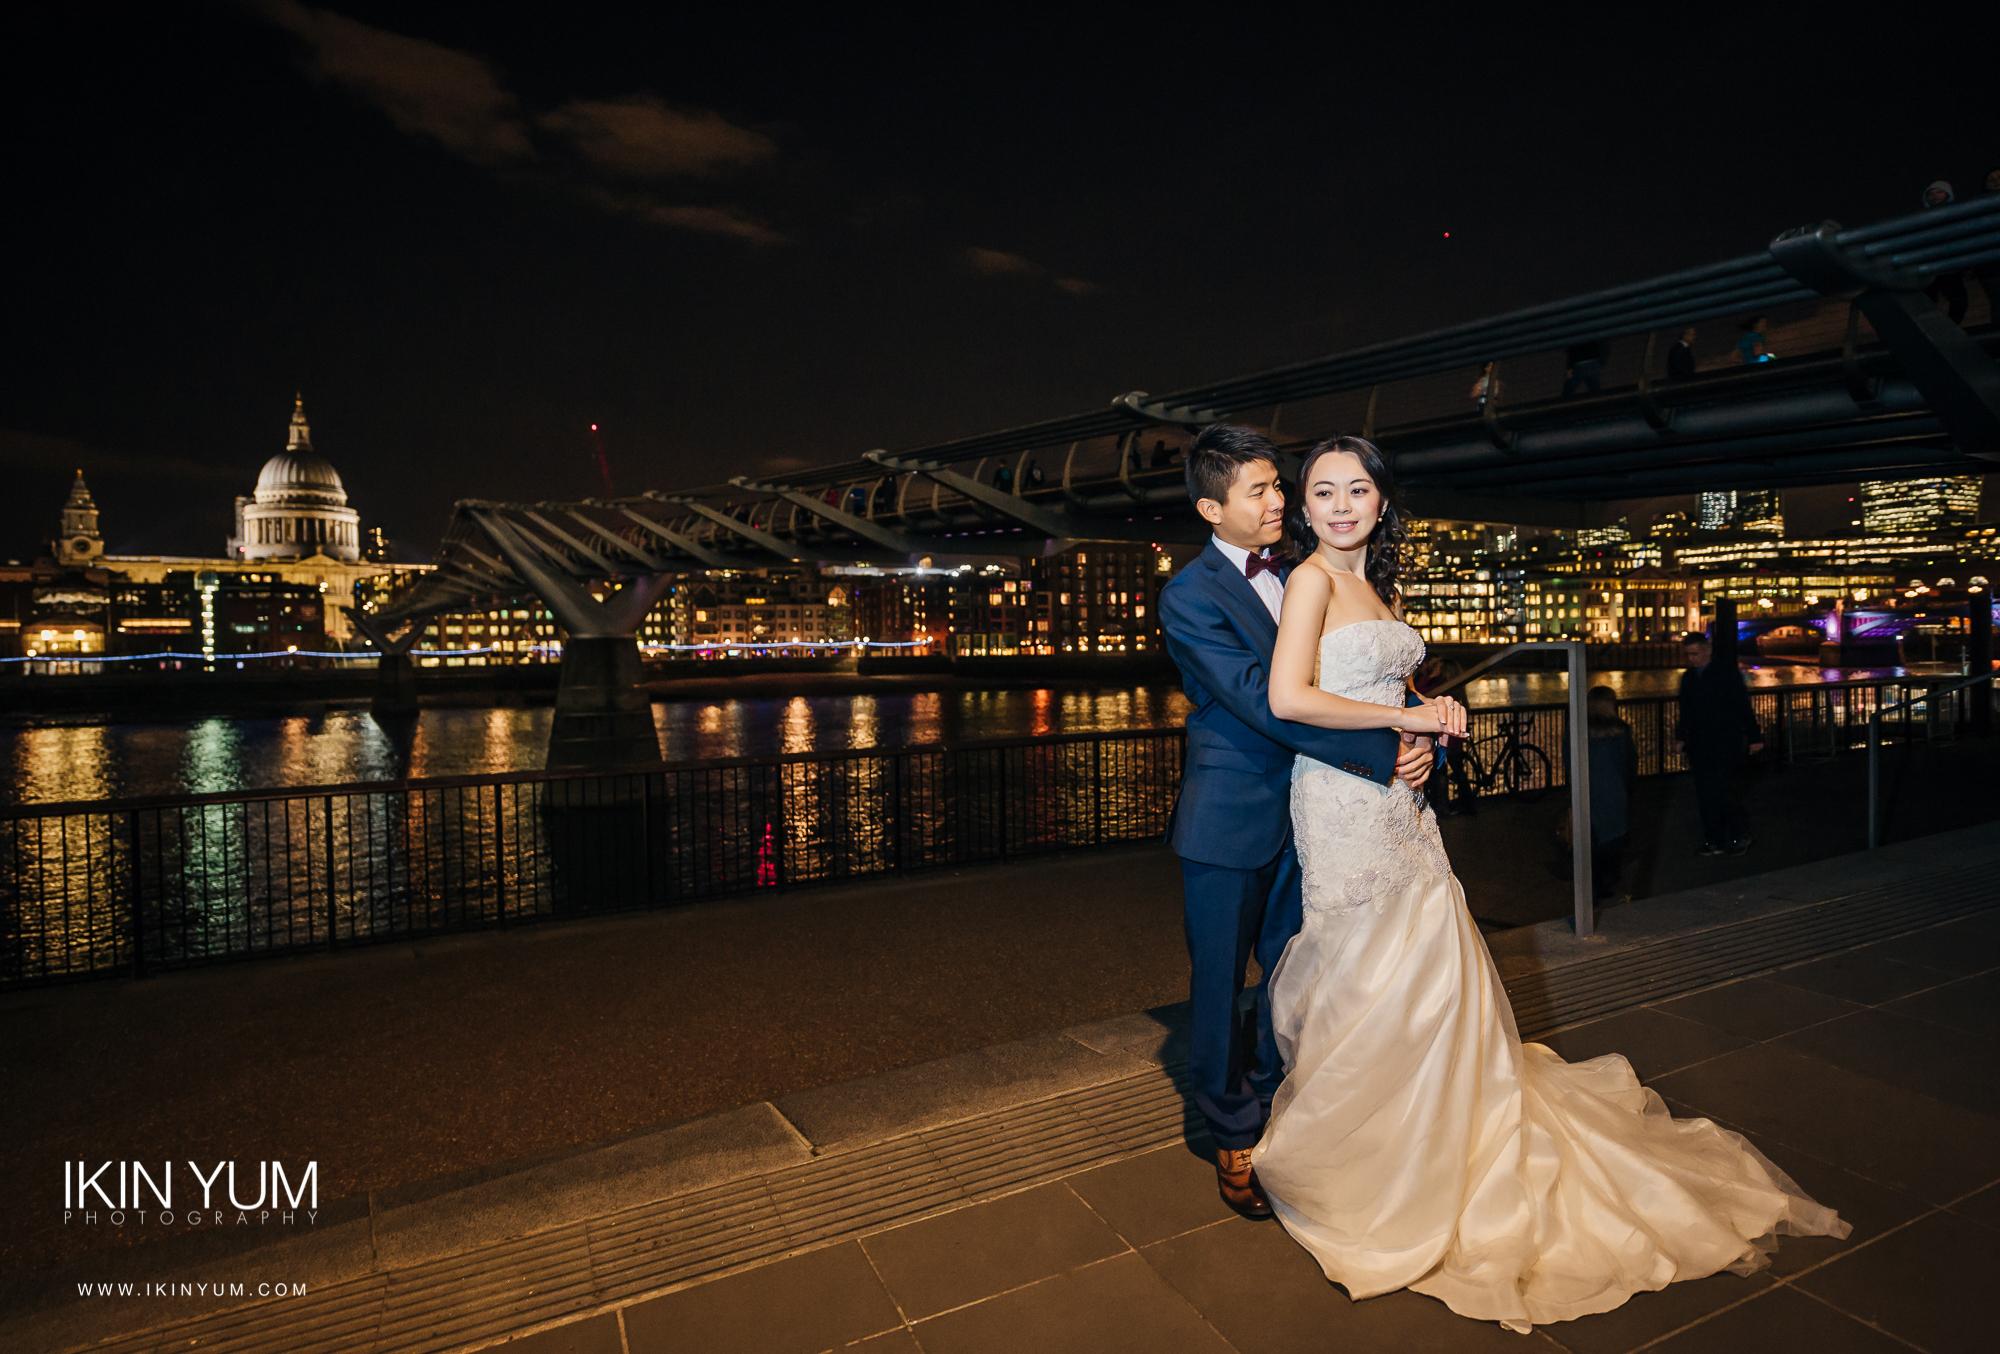 Chloe & Carlos Pre-Wedding Shoot- Ikin Yum Photography-0146.jpg